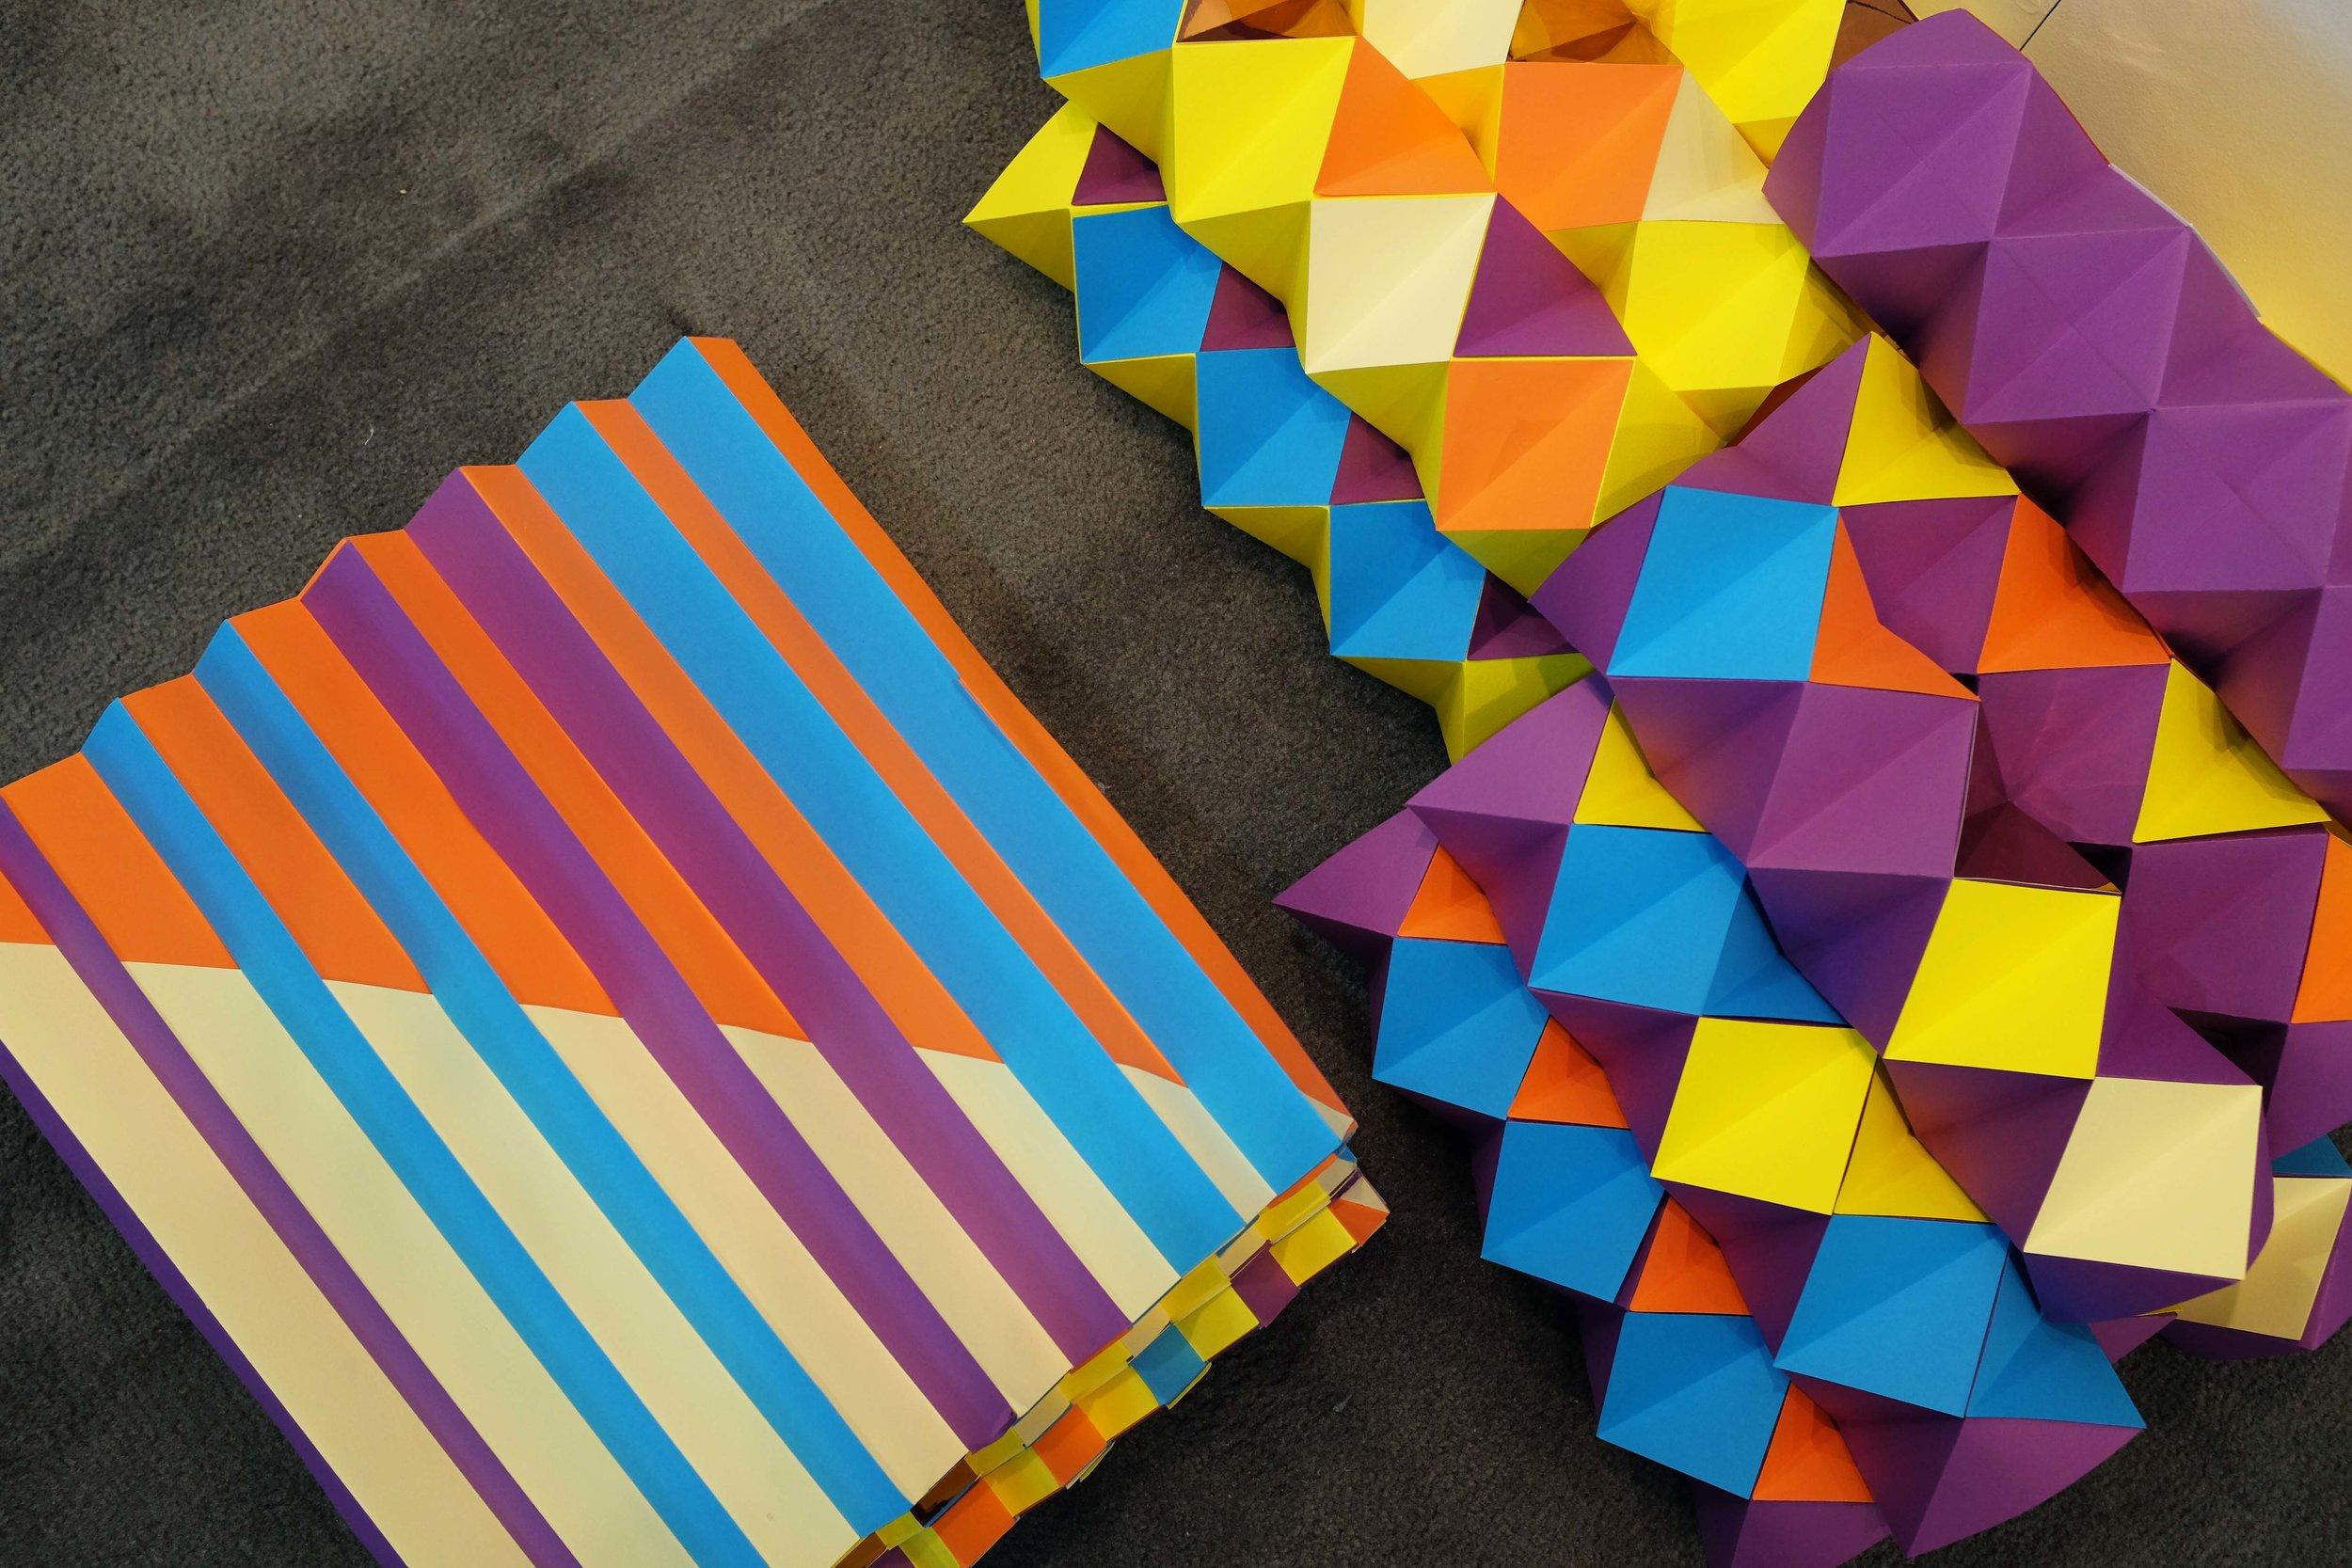 miss-cloudy-pauline-loctin-artist-project-2019-paper-art-origami-entrance-toronto-12.jpg